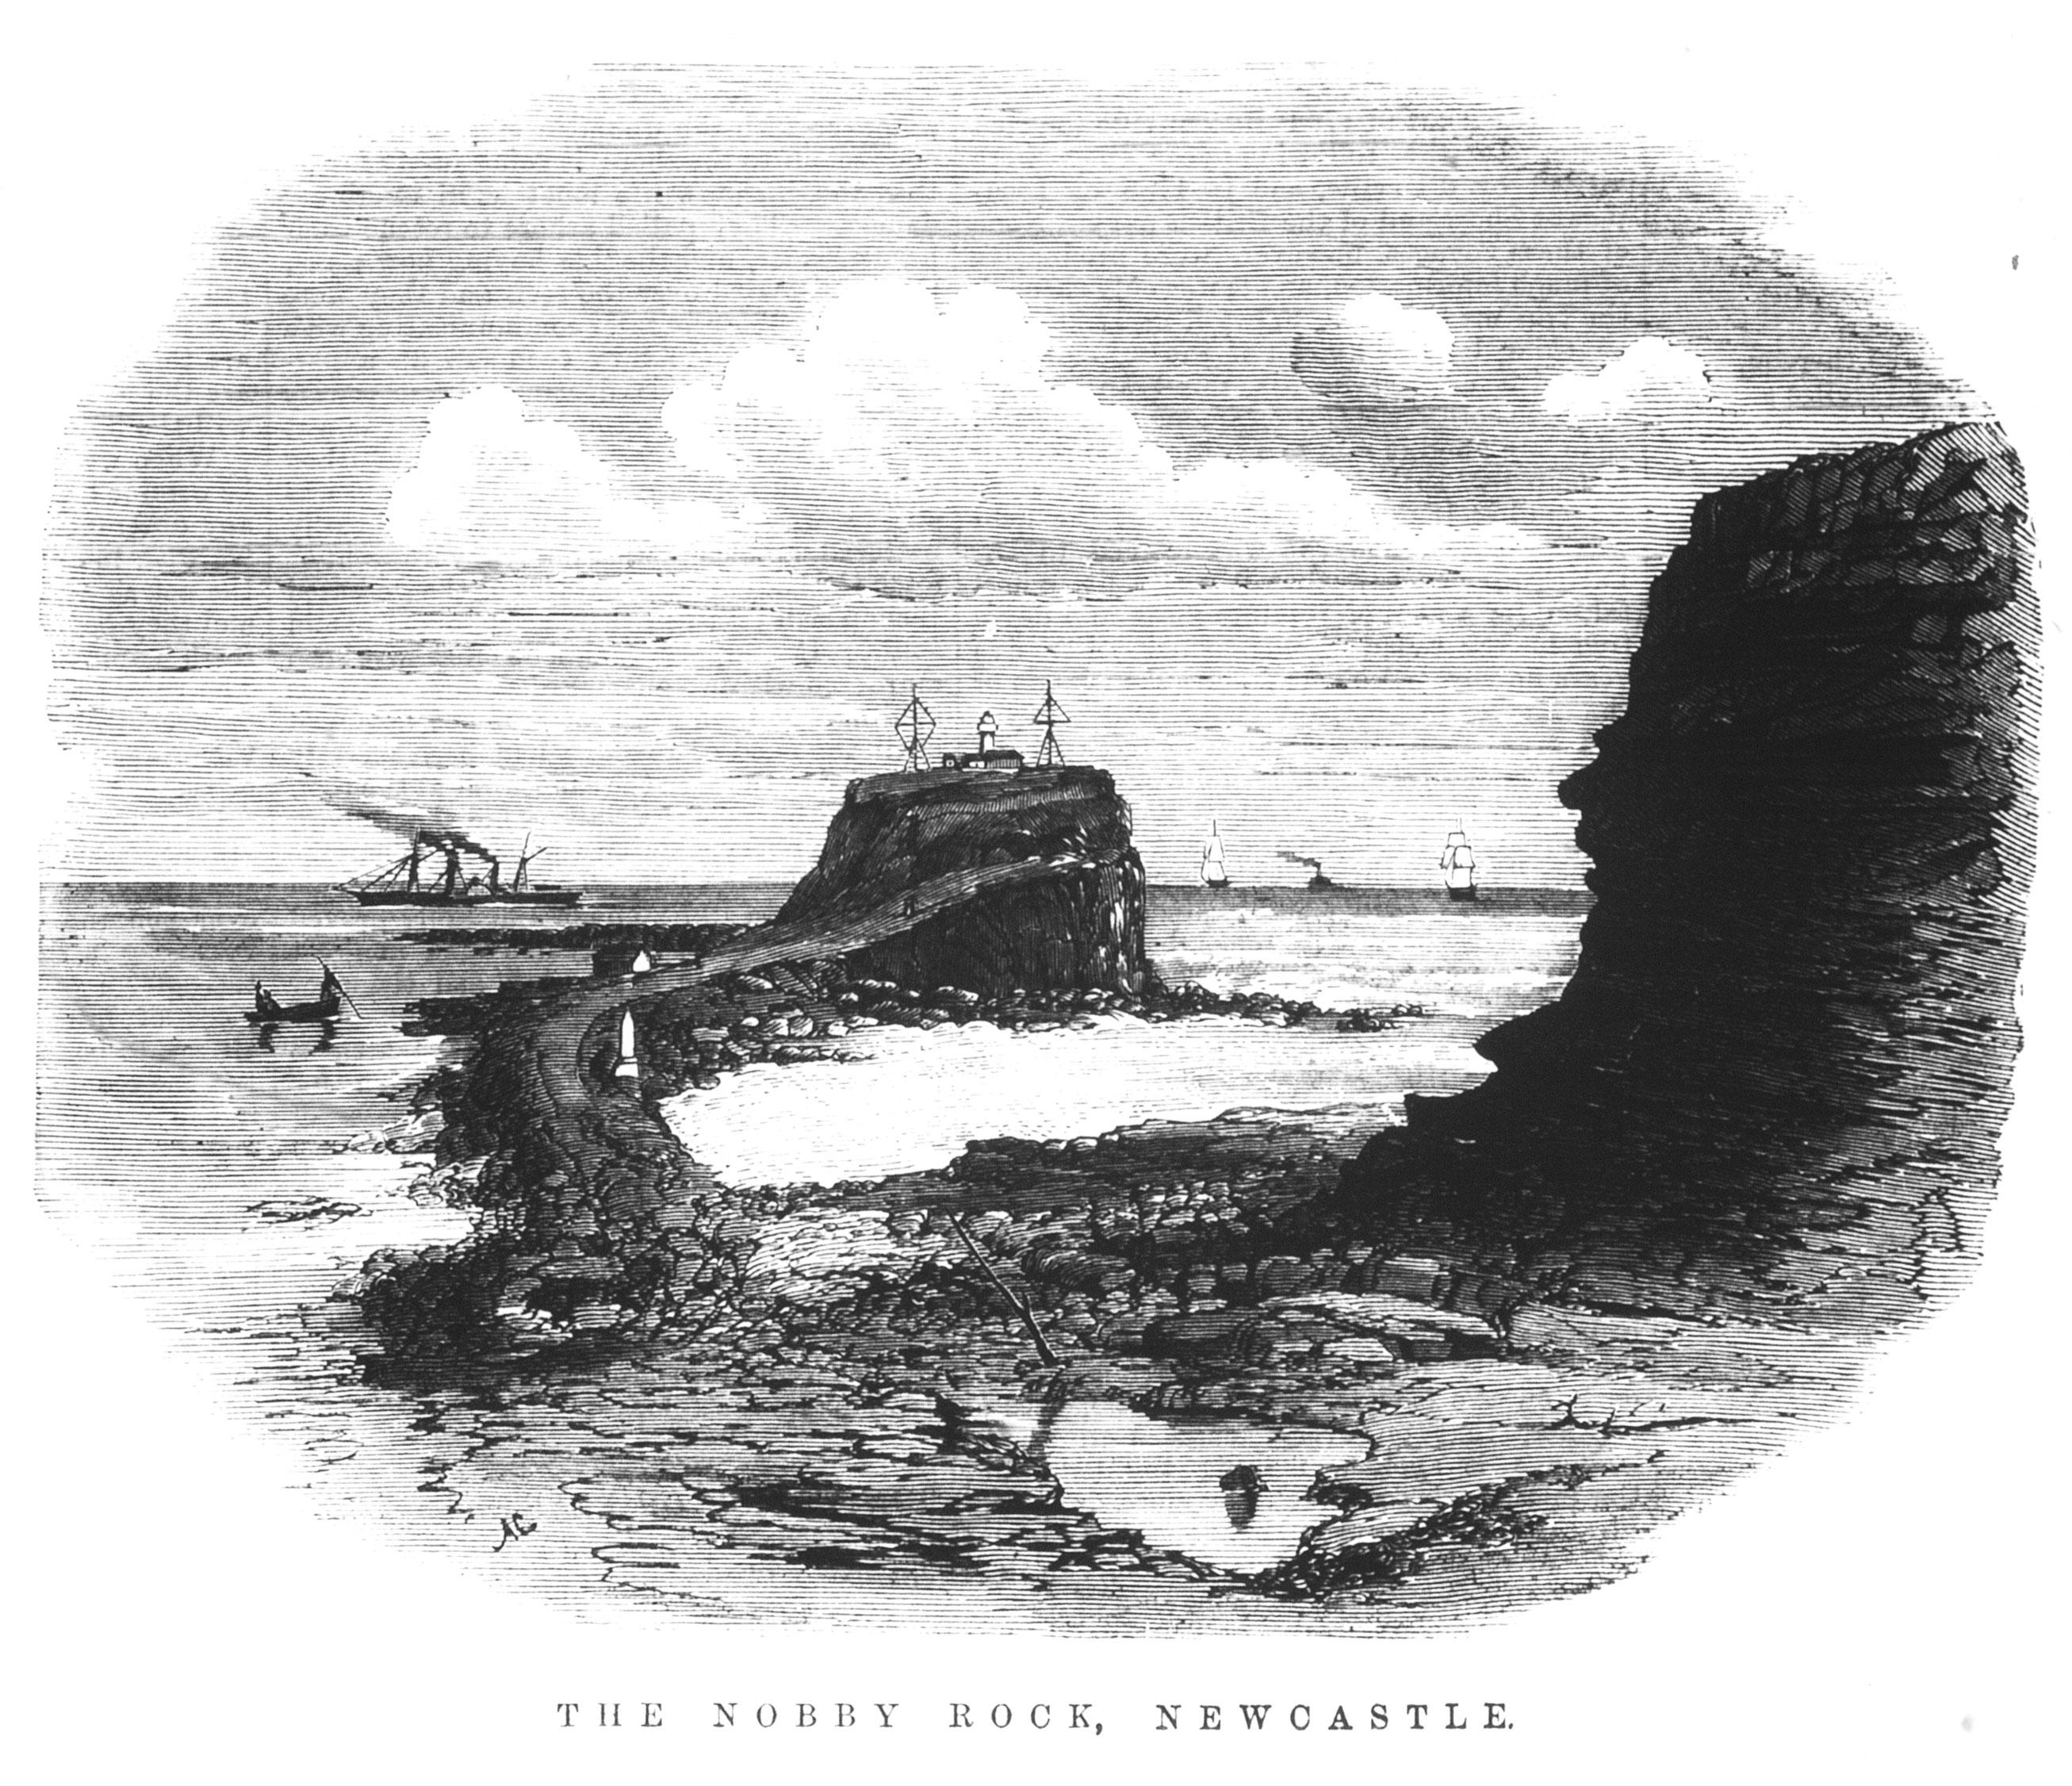 The Nobby Rock Newcastle (Illustrated Sydney News 25 November 1871 p.189)